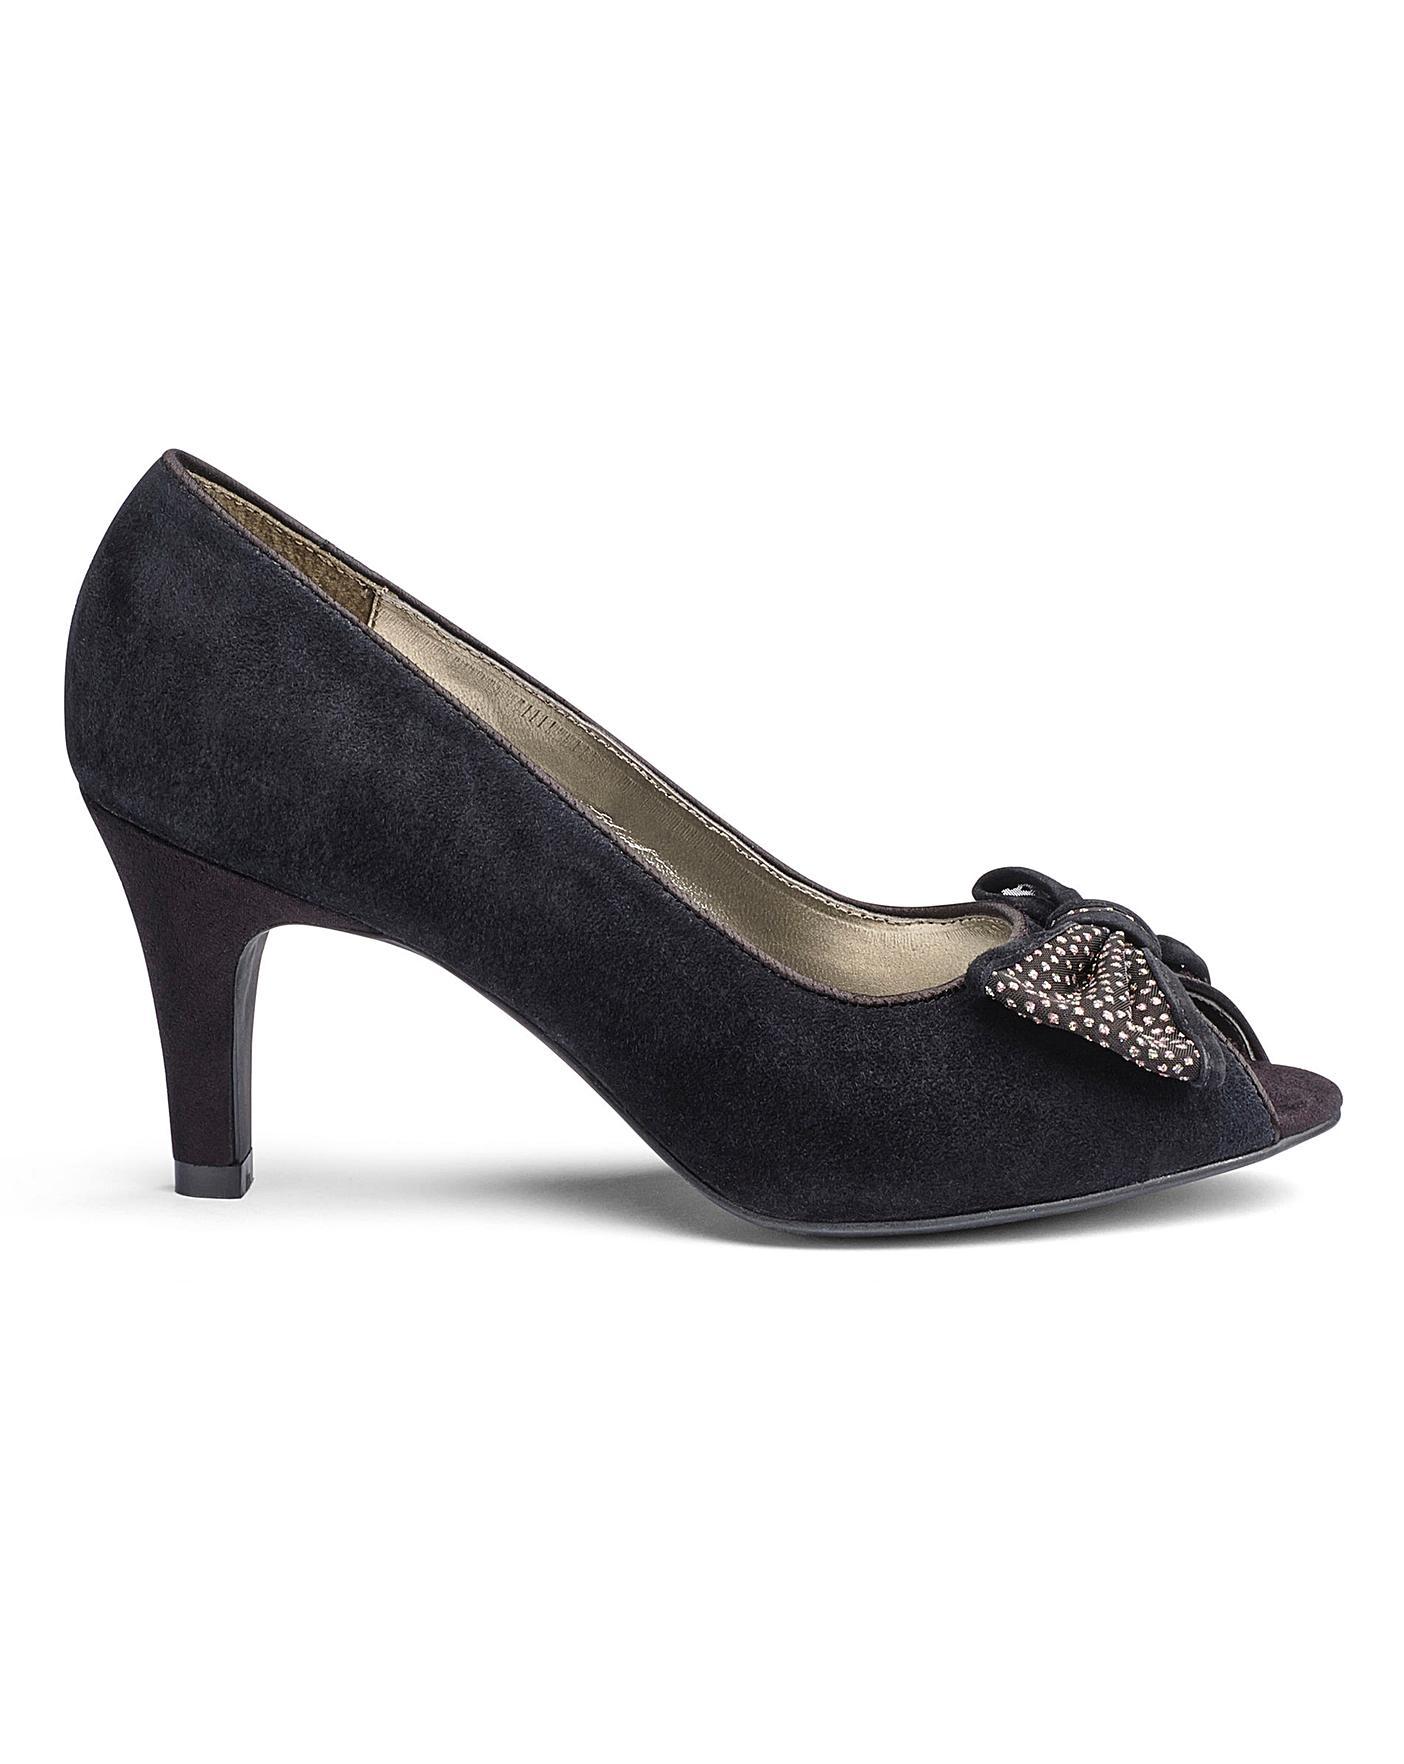 Lotus Peep Toe Shoes E Fit | Oxendales